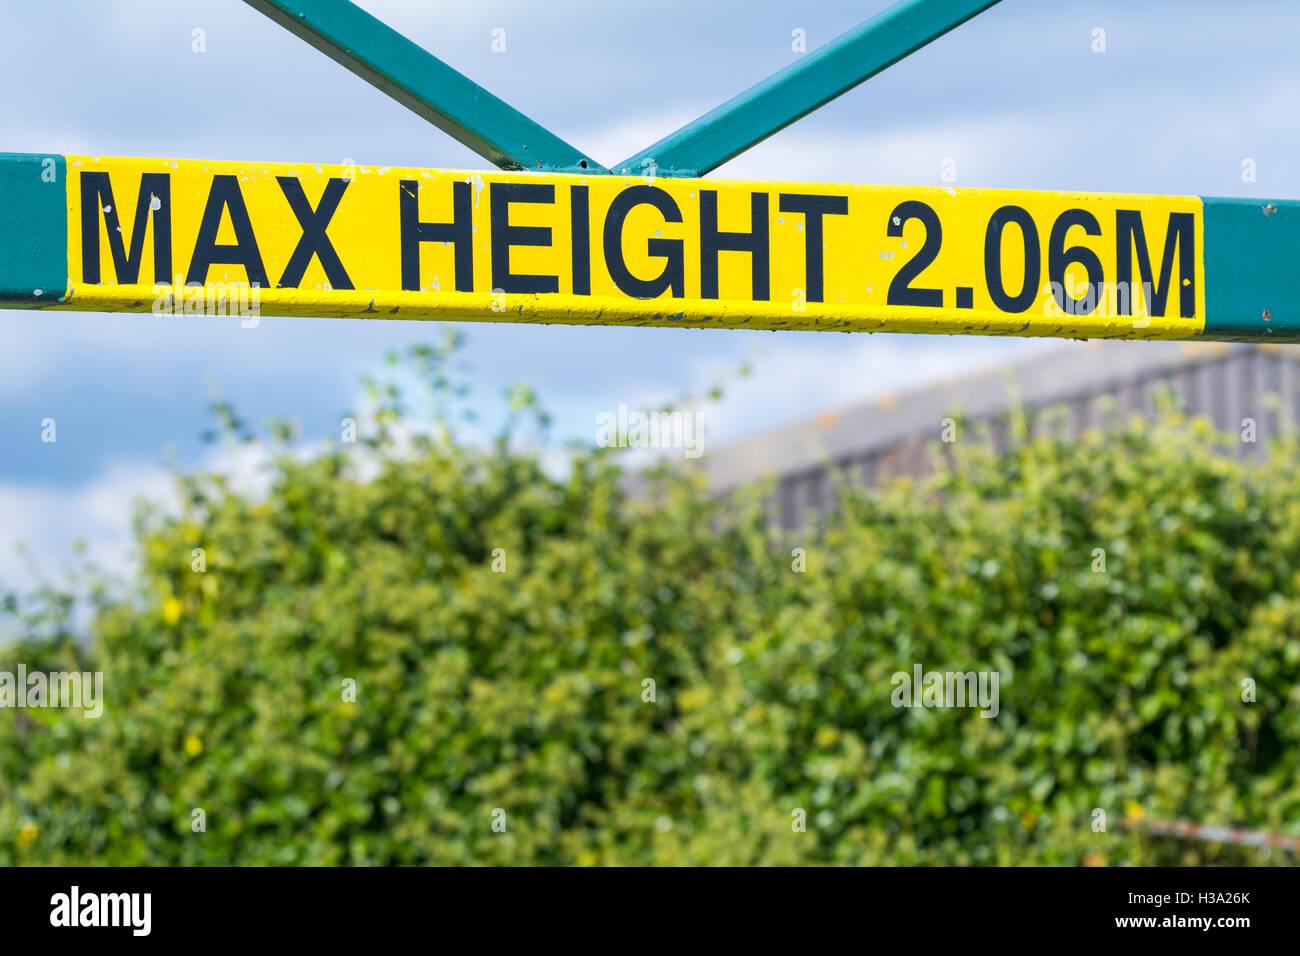 Hauteur Max 2.06M signe. Photo Stock